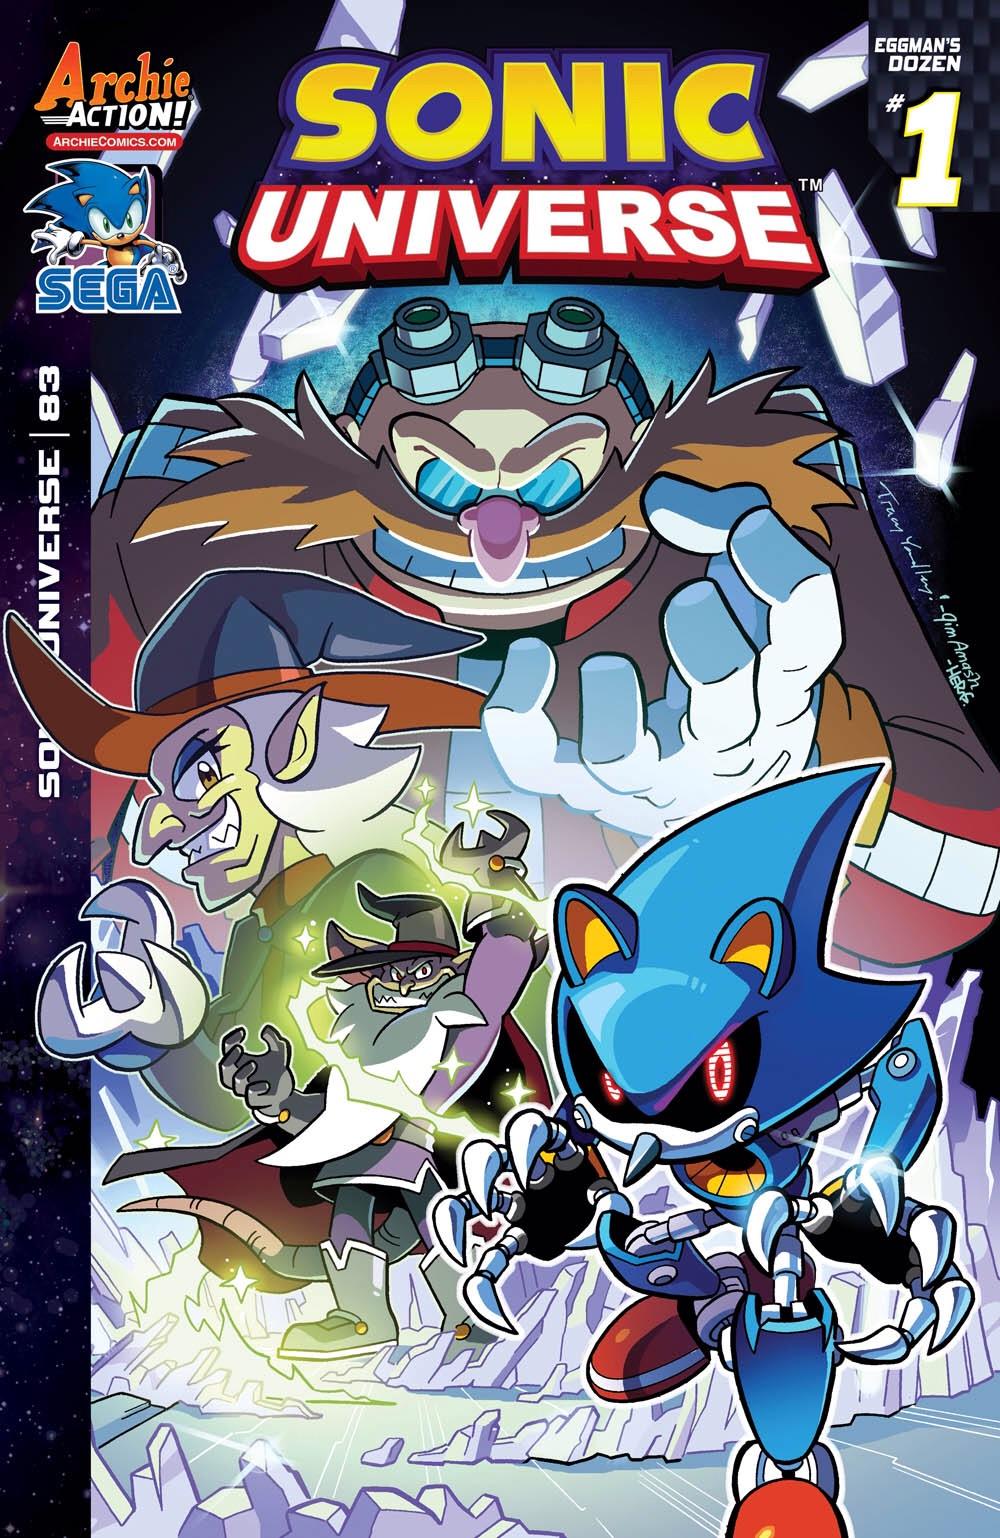 Archie Sonic Universe Issue 83 | Mobius Encyclopaedia | FANDOM